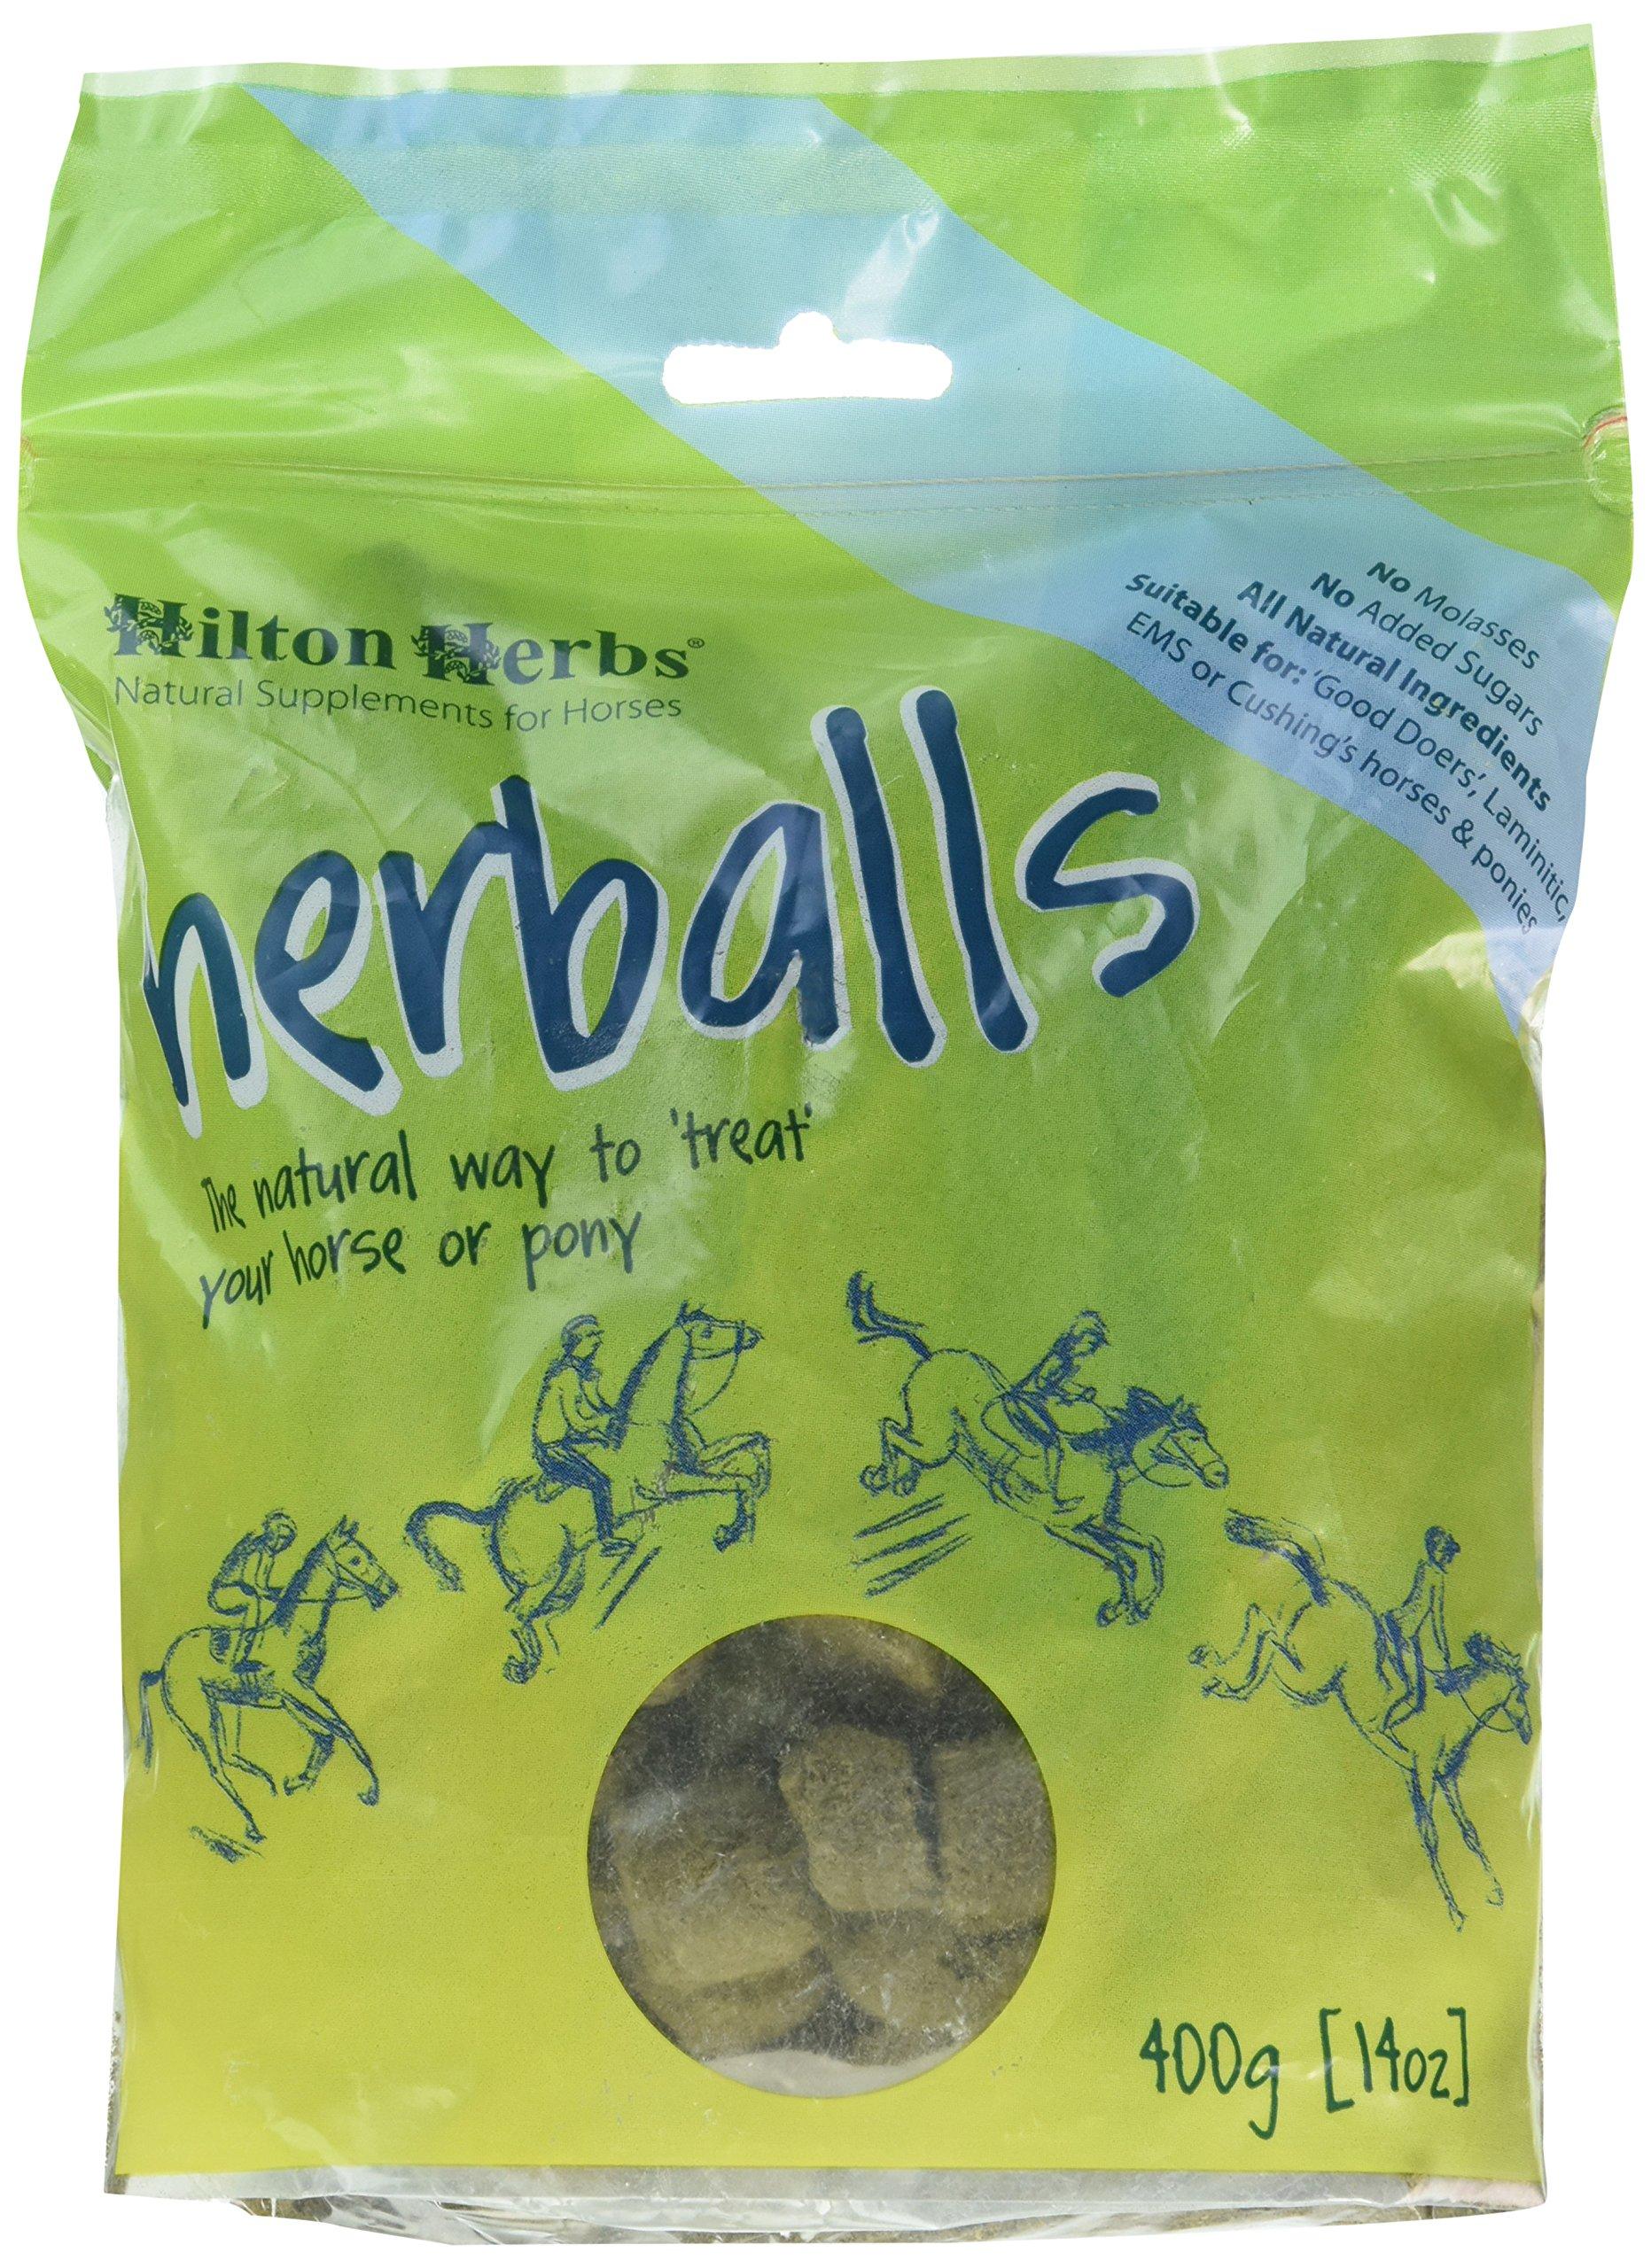 Hilton Herbs Herballs Horse Treat